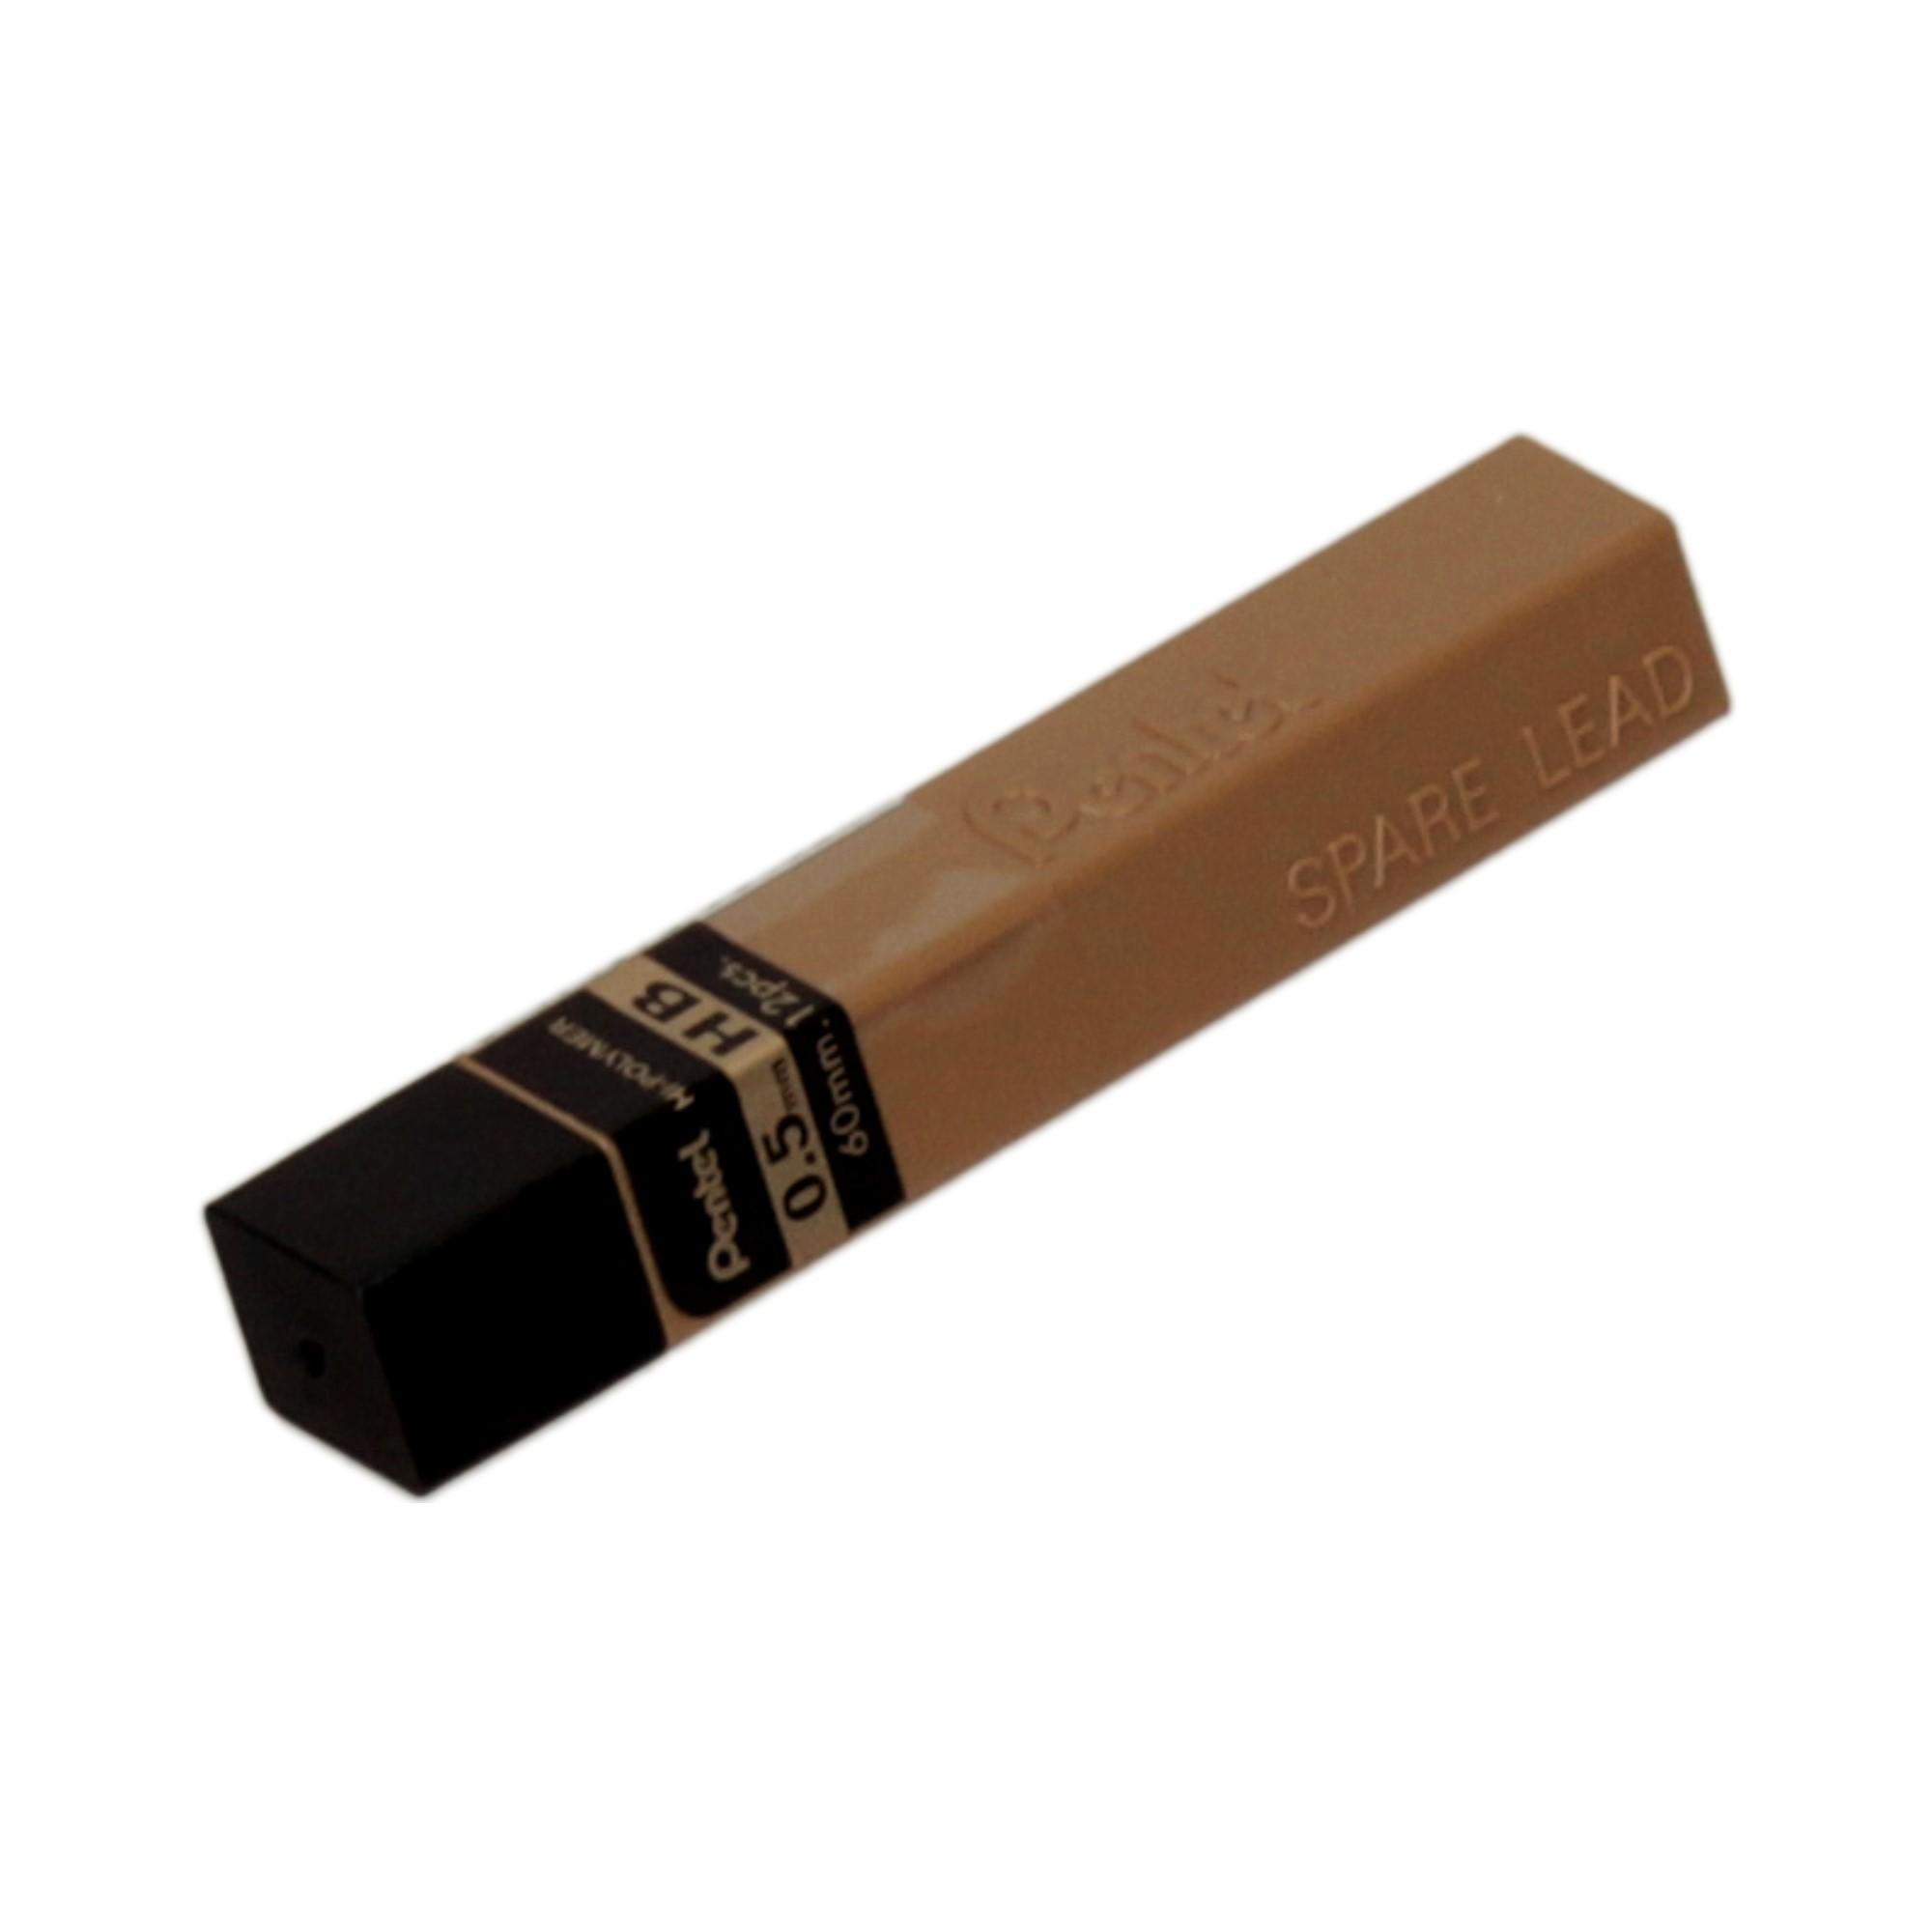 Grafit 0.5mm HB (12) Pentel